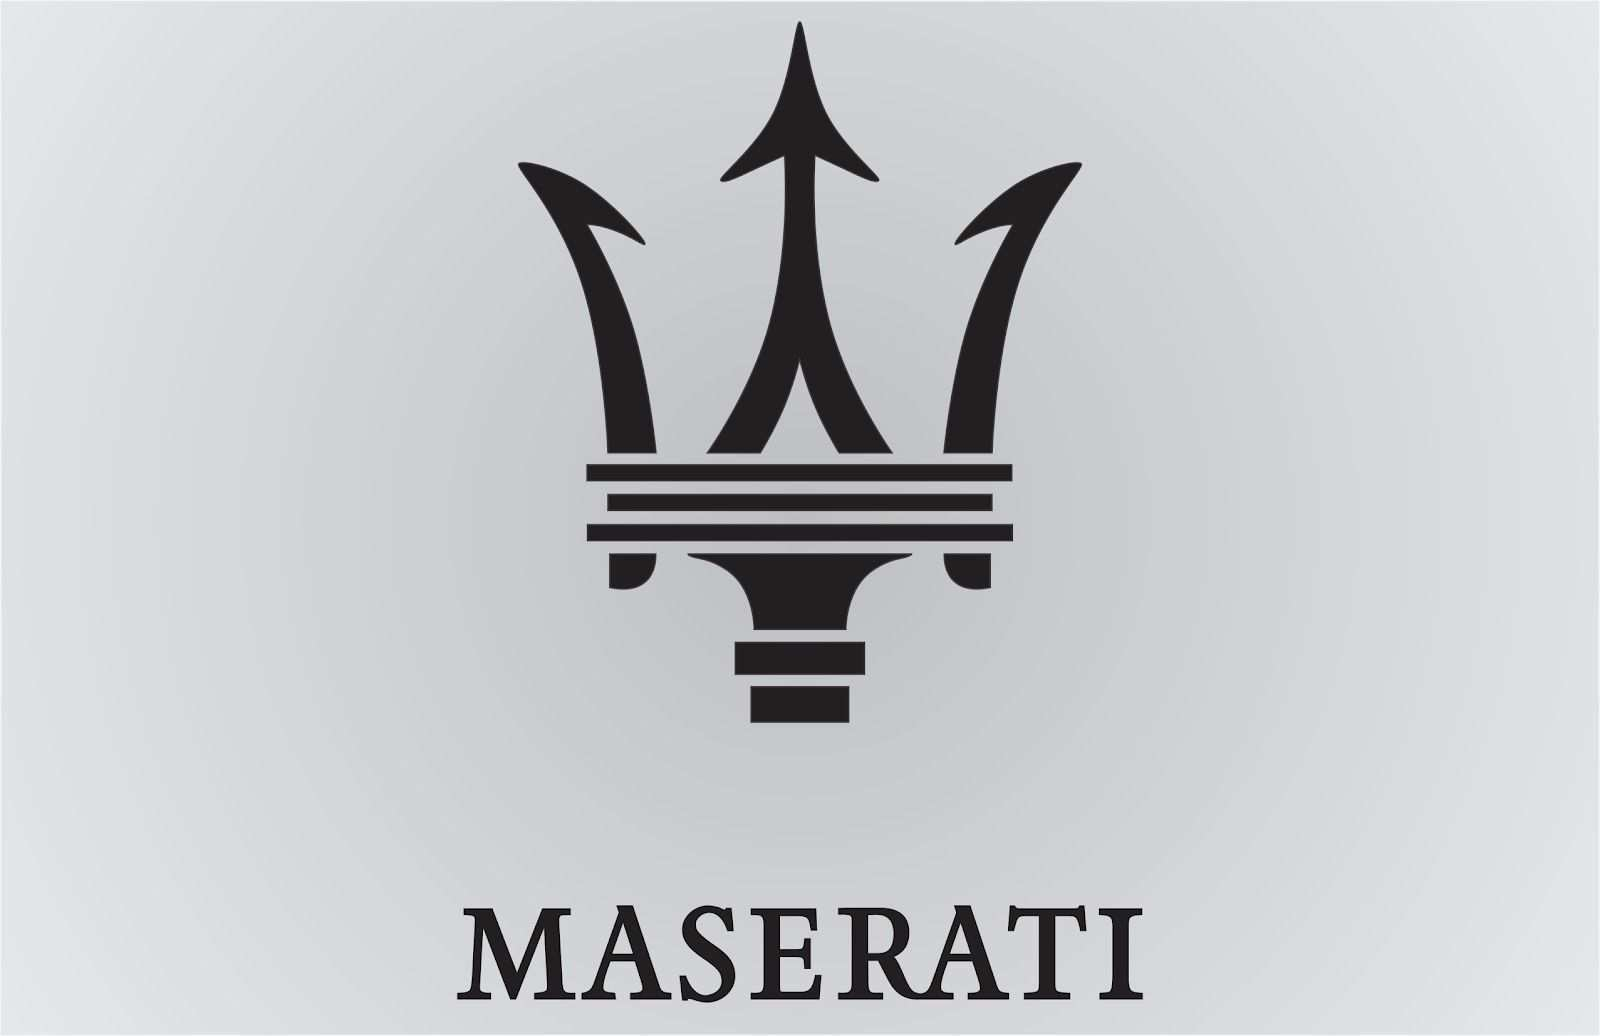 Masarati Logo Google Search